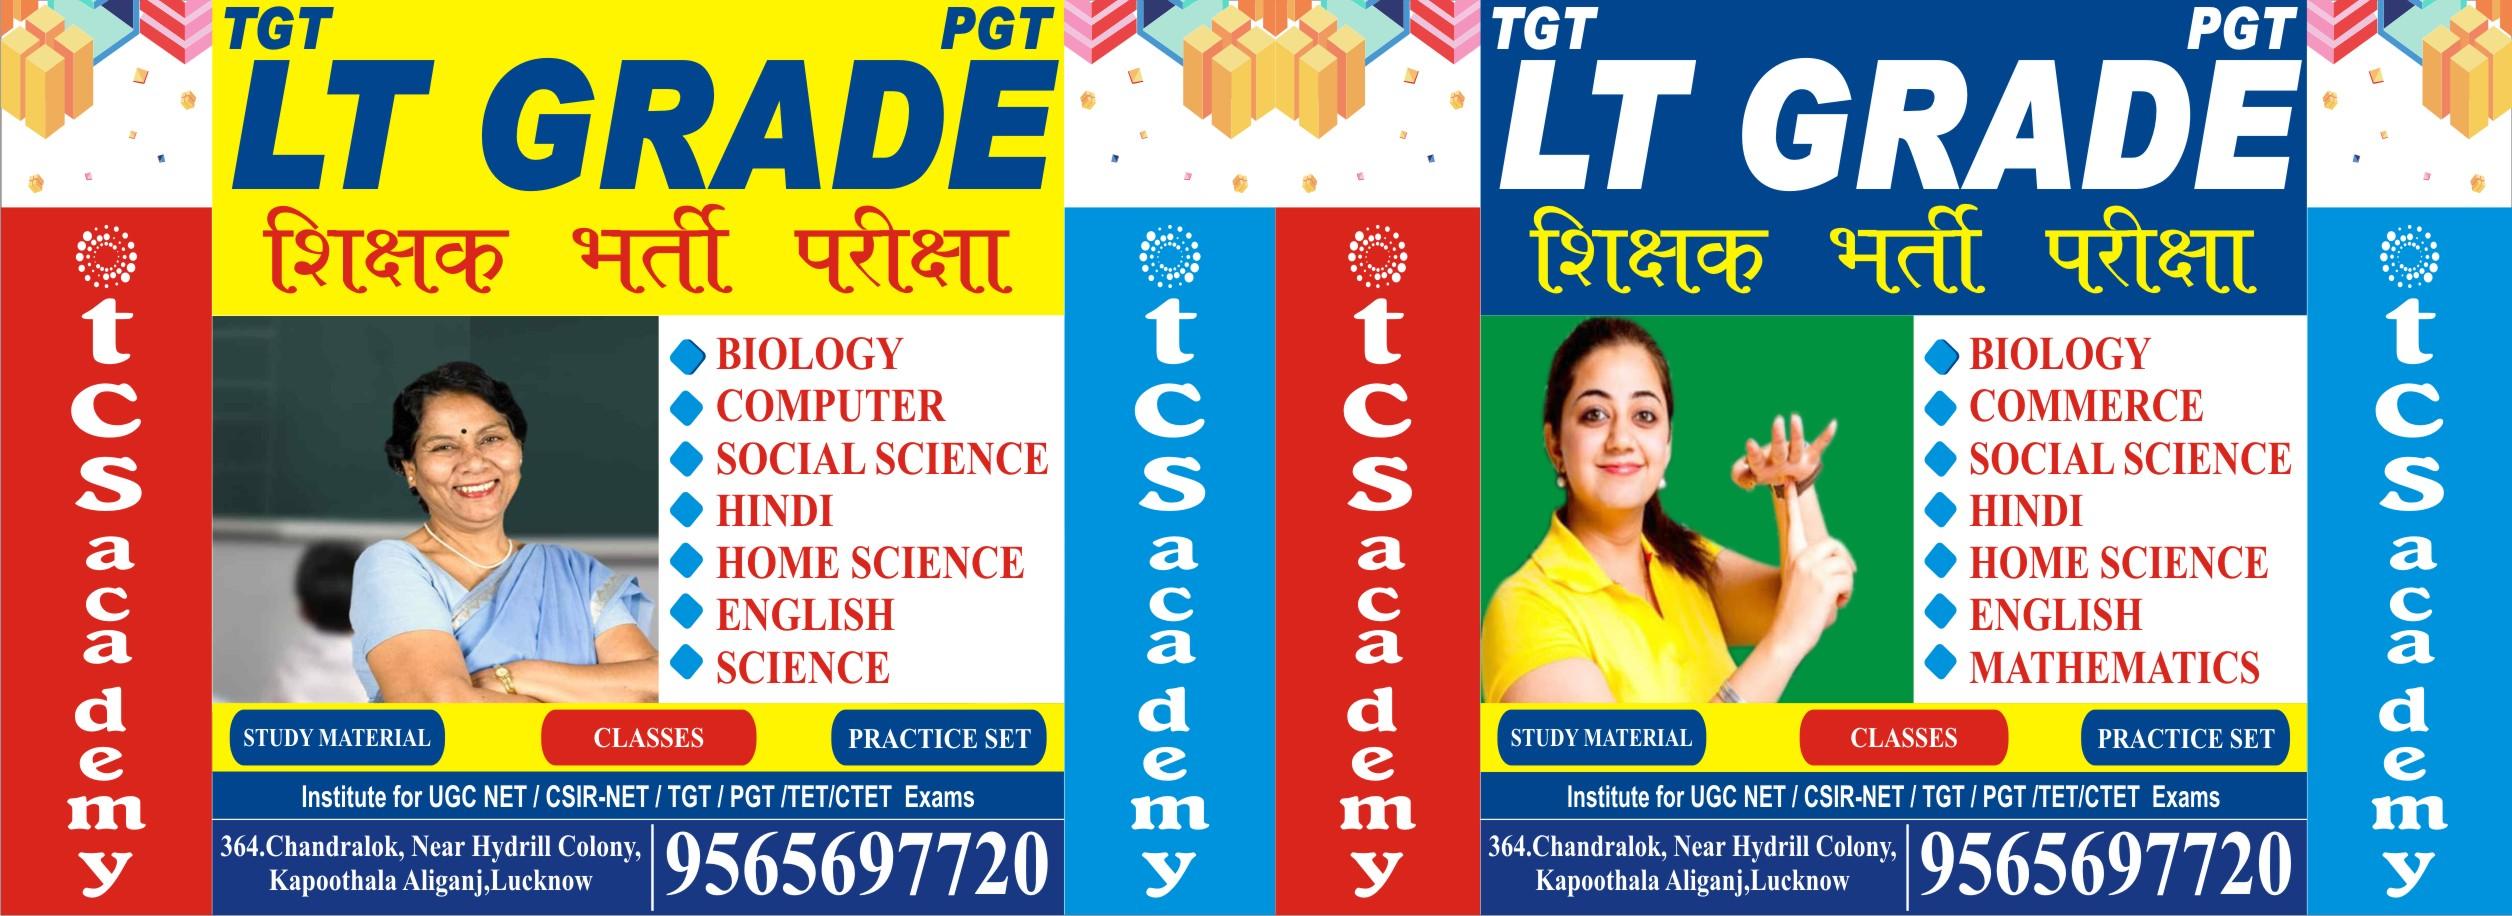 Ugc net exam study material for commerce subject